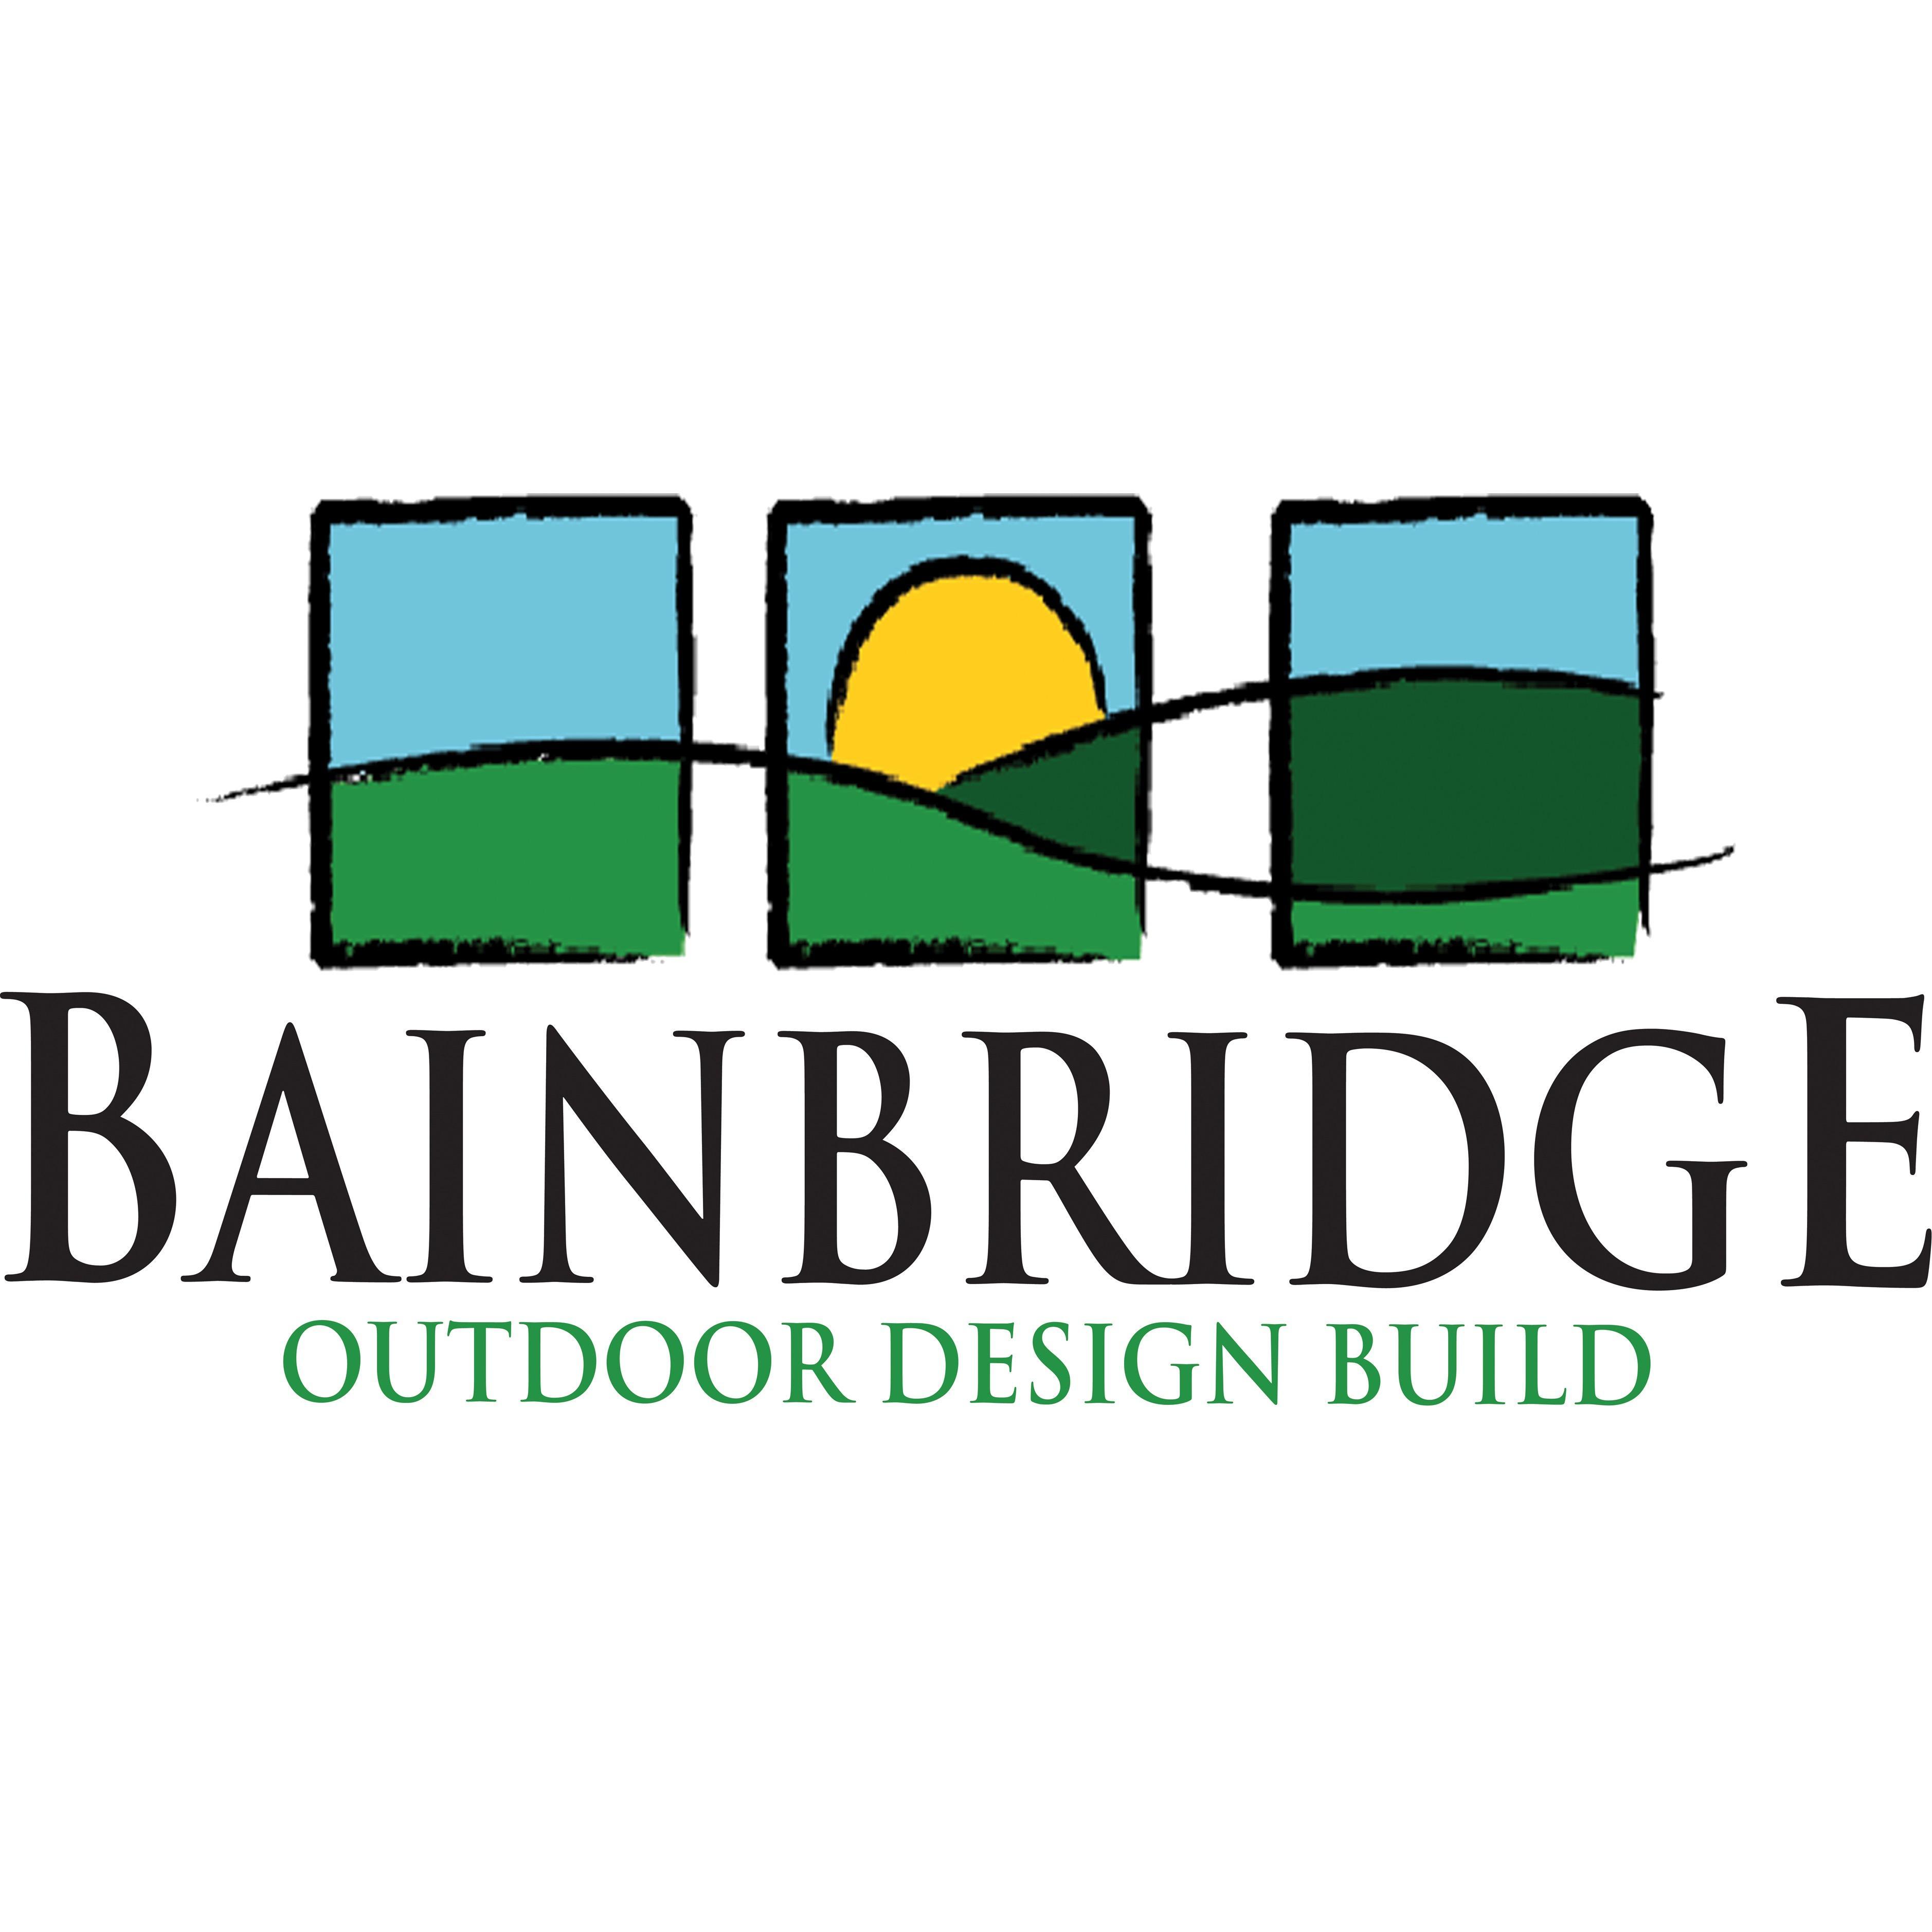 Bainbridge outdoor design build in dulles va 20166 for Bainbridge design